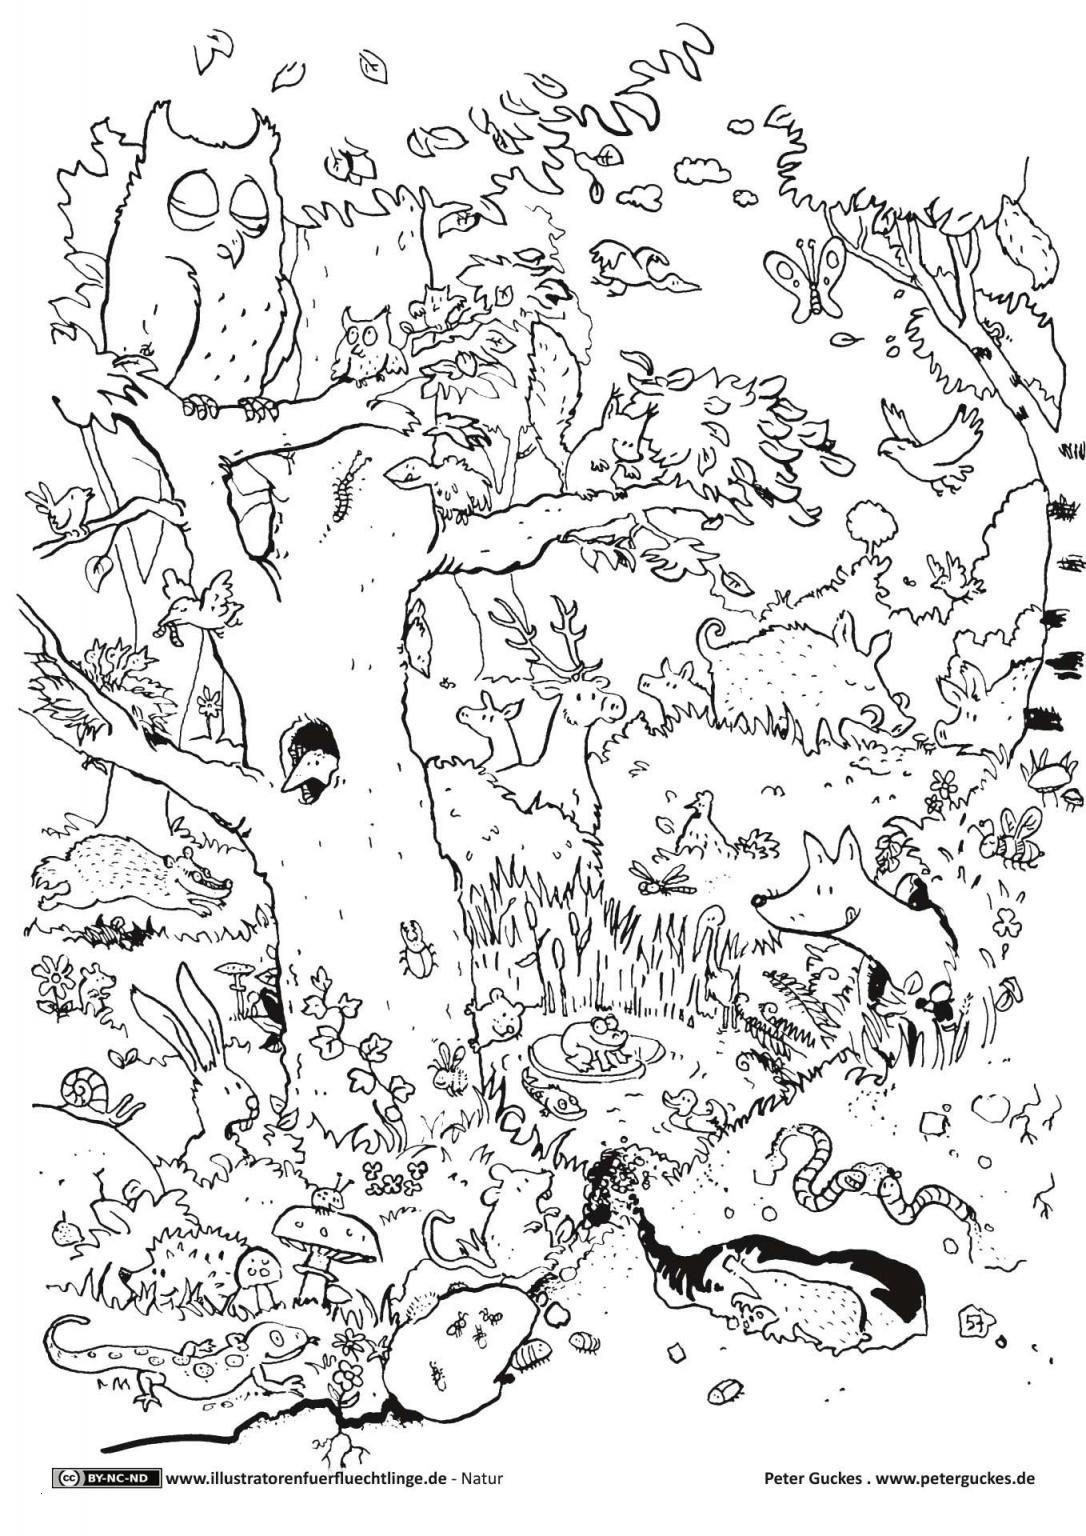 Kung Fu Panda Ausmalbilder Genial Malvorlagen Igel Best Igel Grundschule 0d Archives Uploadertalk Sammlung